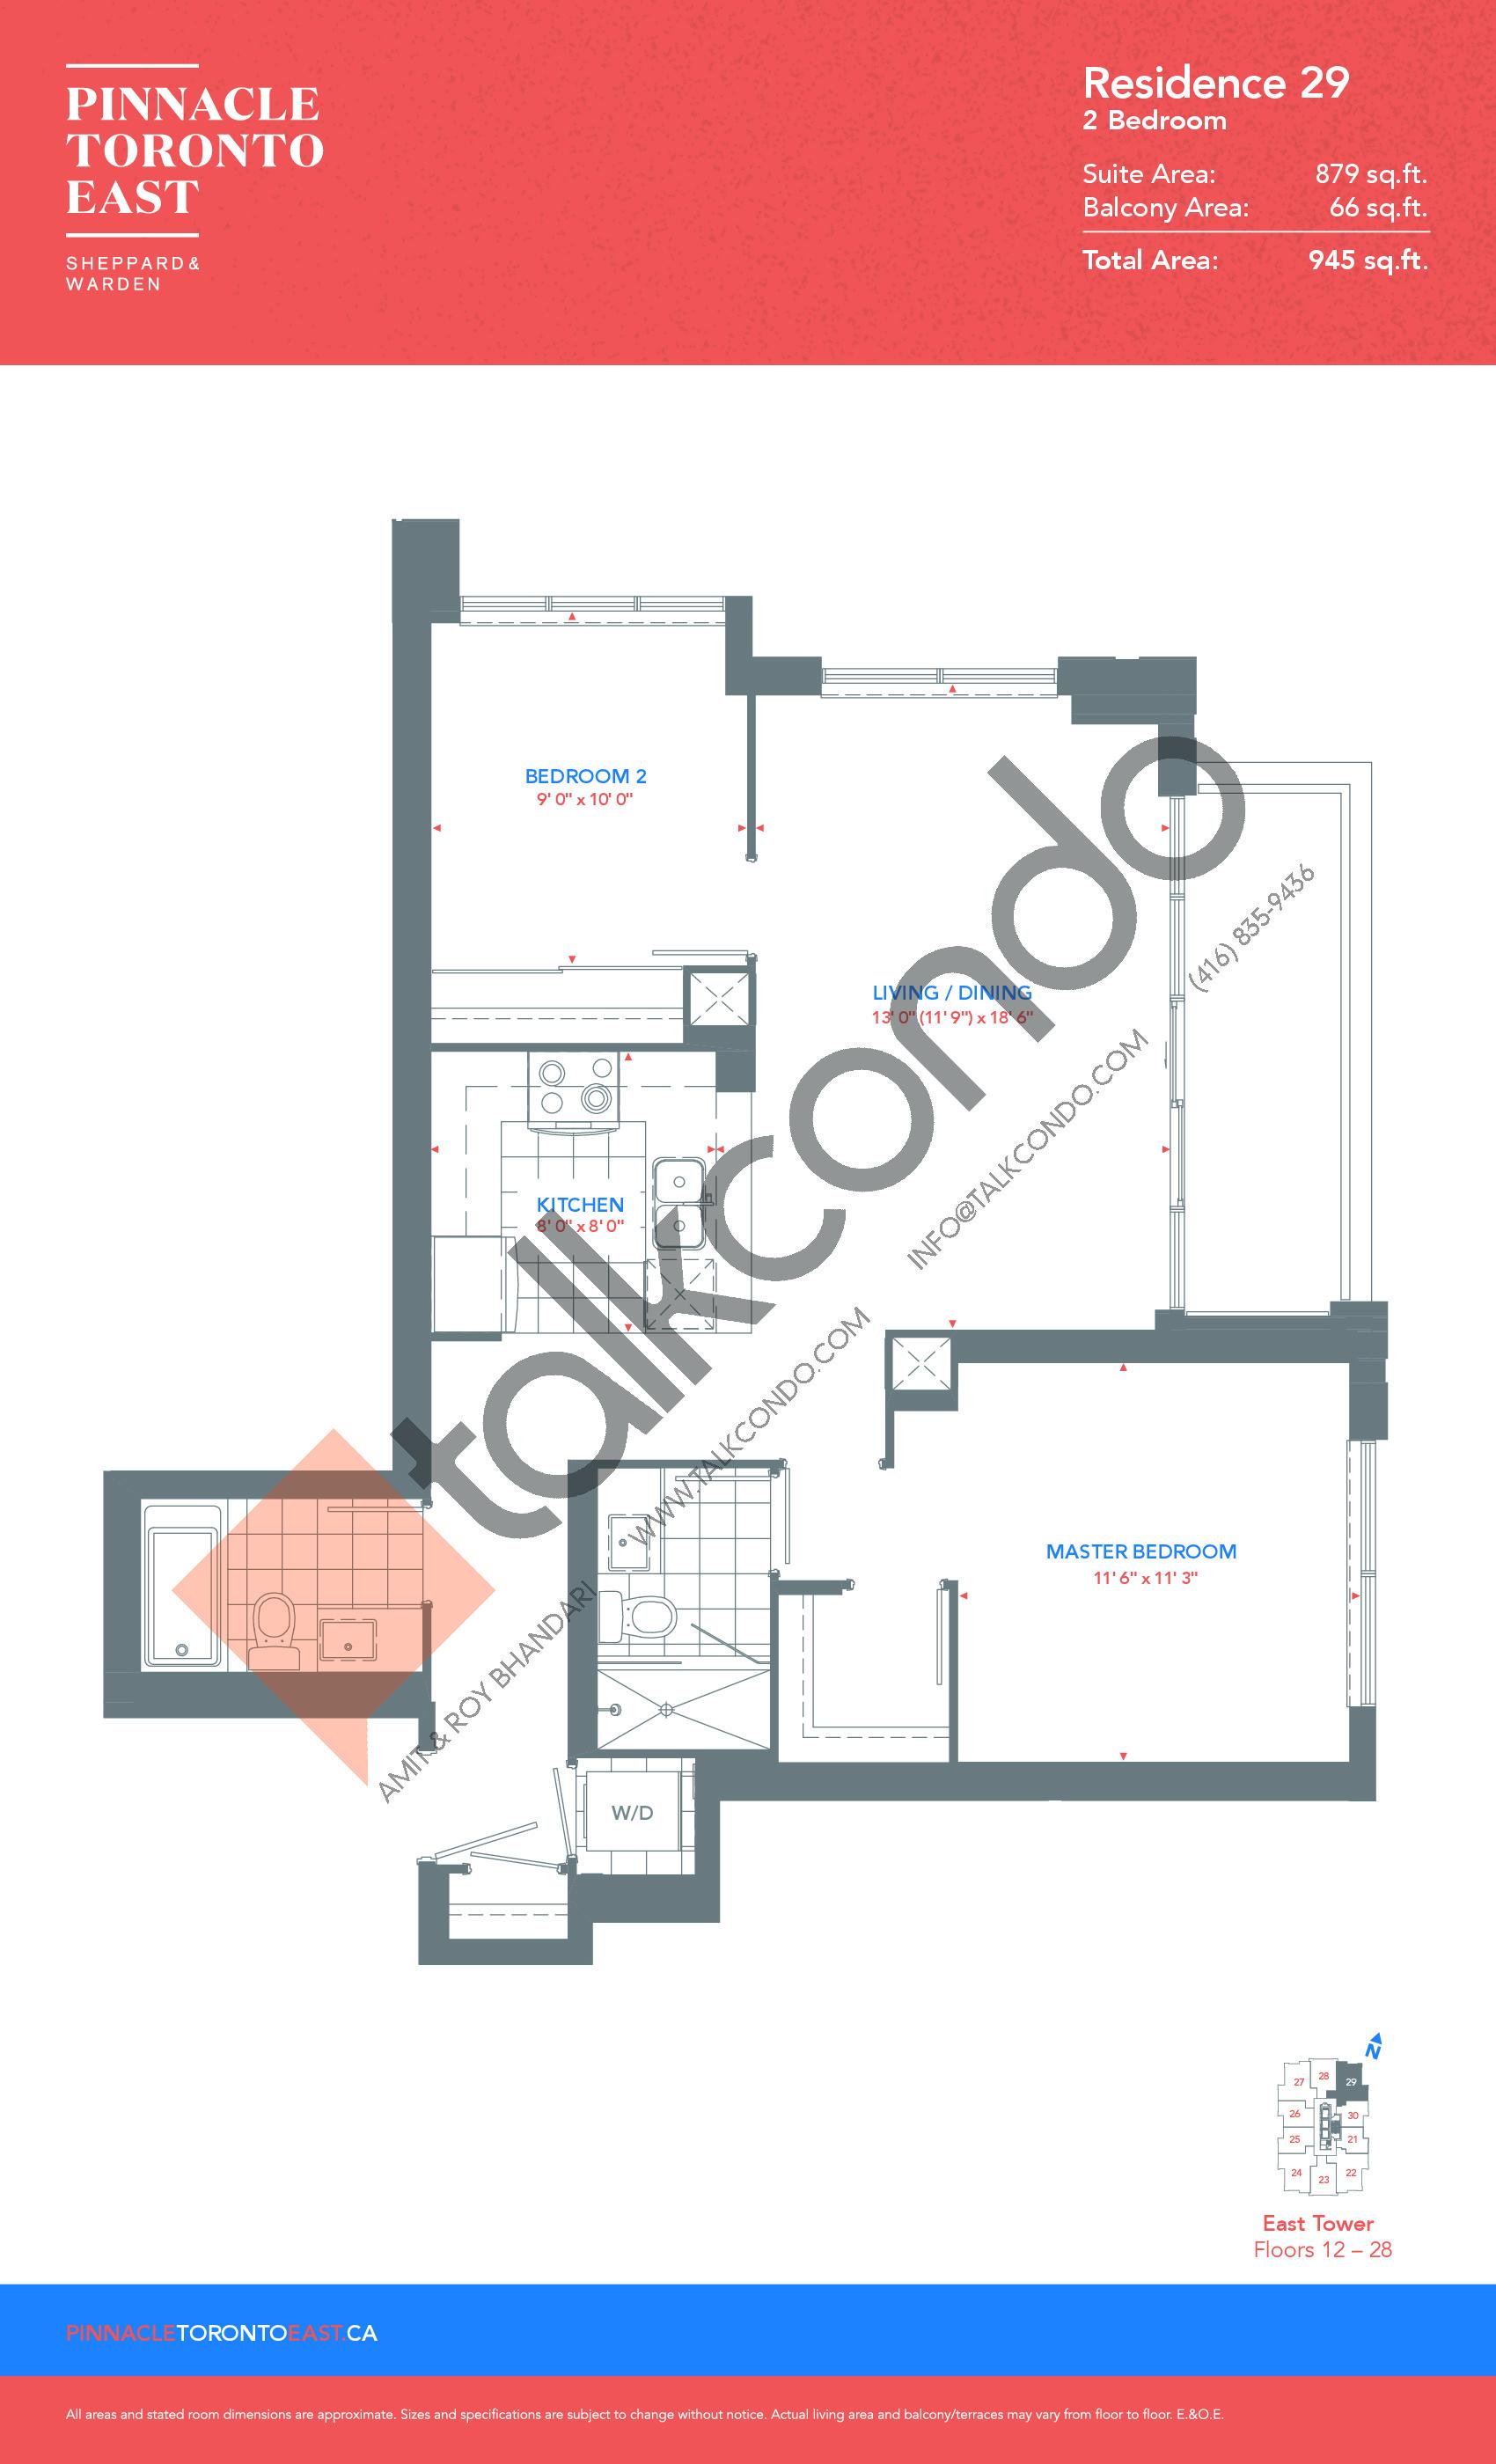 Residence 29 - East Tower Floor Plan at Pinnacle Toronto East Condos - 879 sq.ft